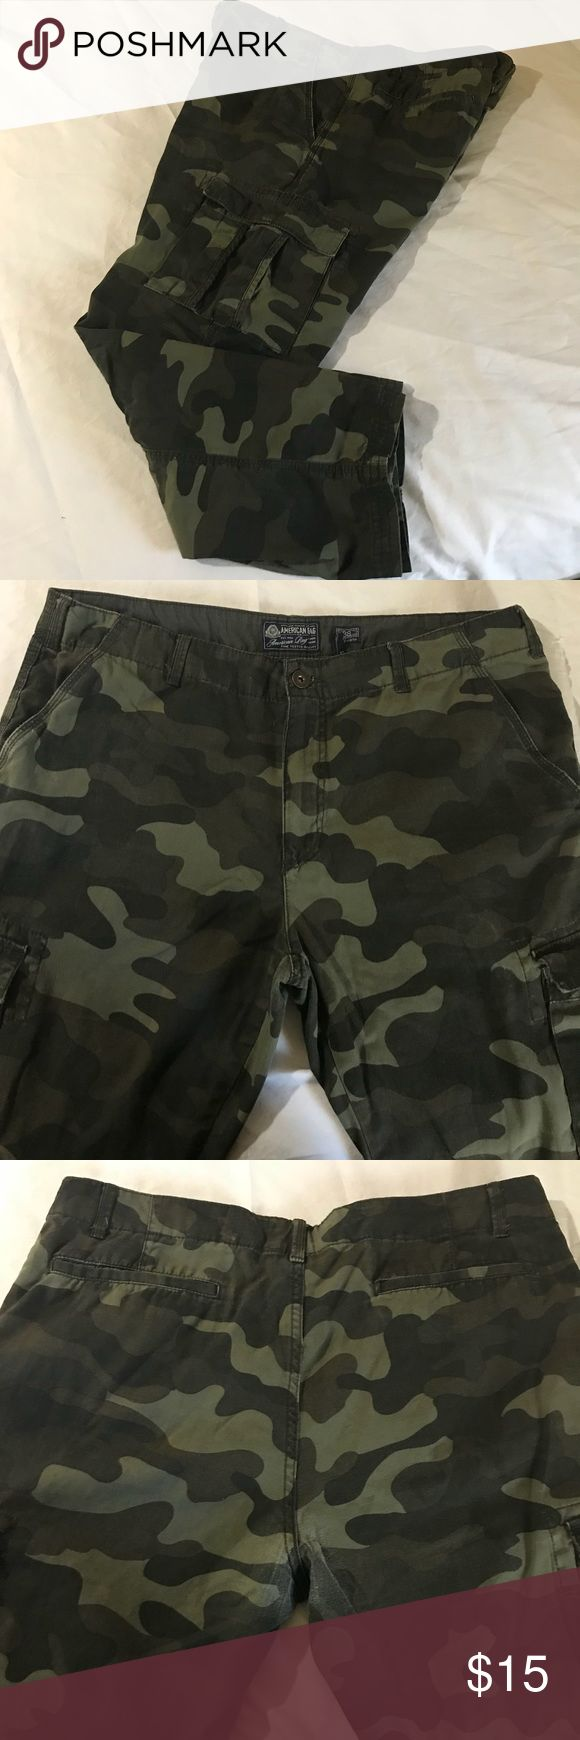 American Rag Camo Cargo Pants American Rag Camo Cargo Pants Size 38/30 American Rag Pants Cargo